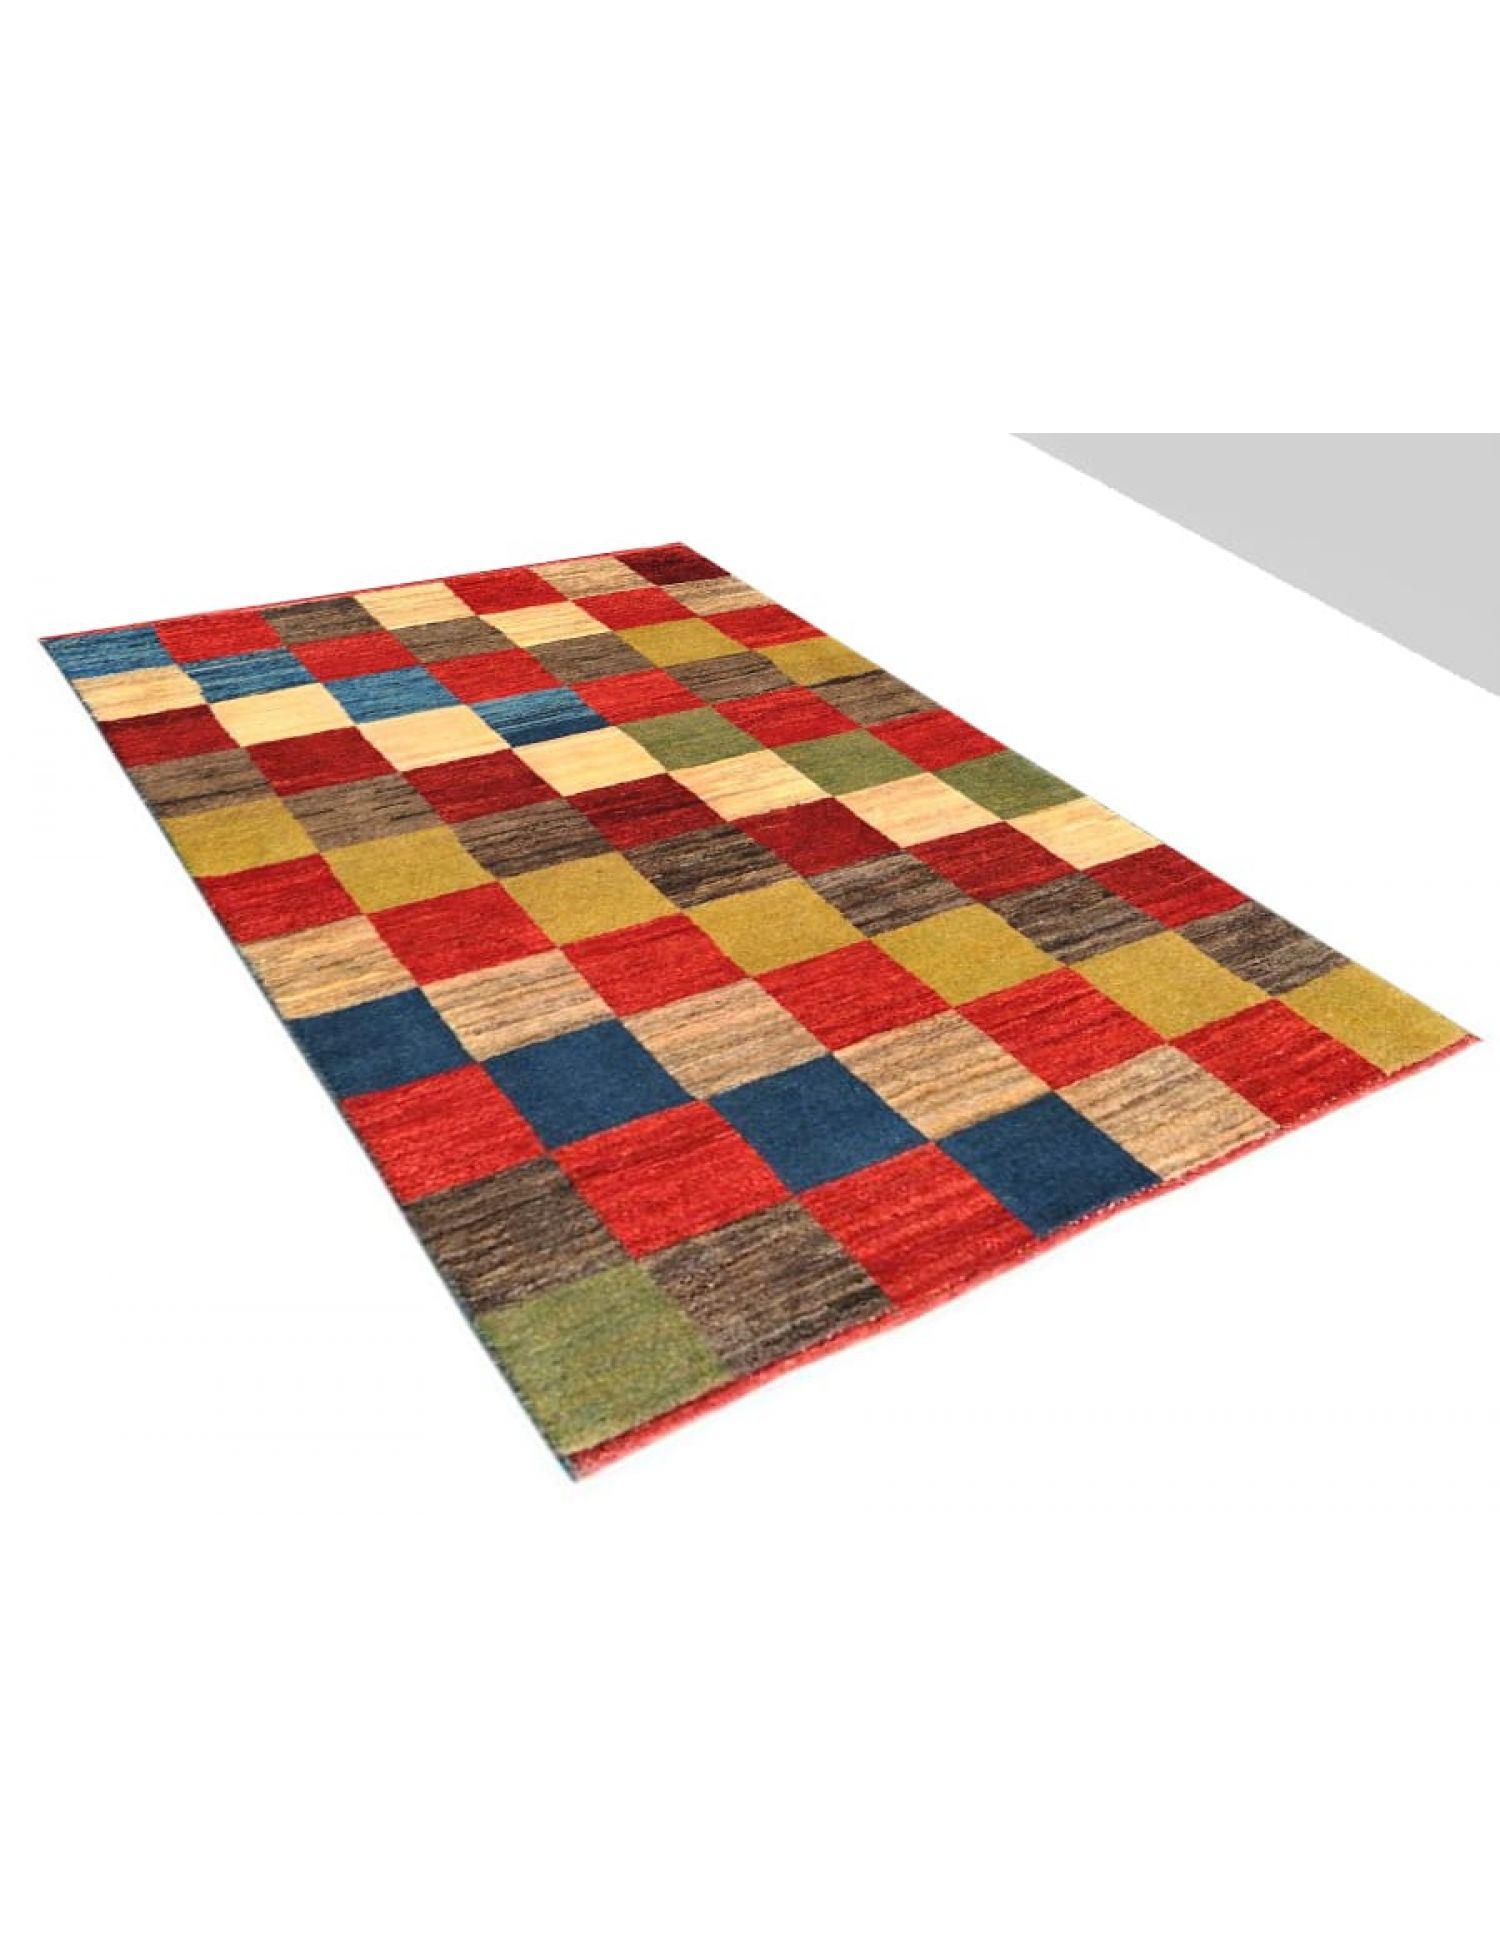 Moderne Teppiche  mehrfarbig <br/>160 x 112 cm